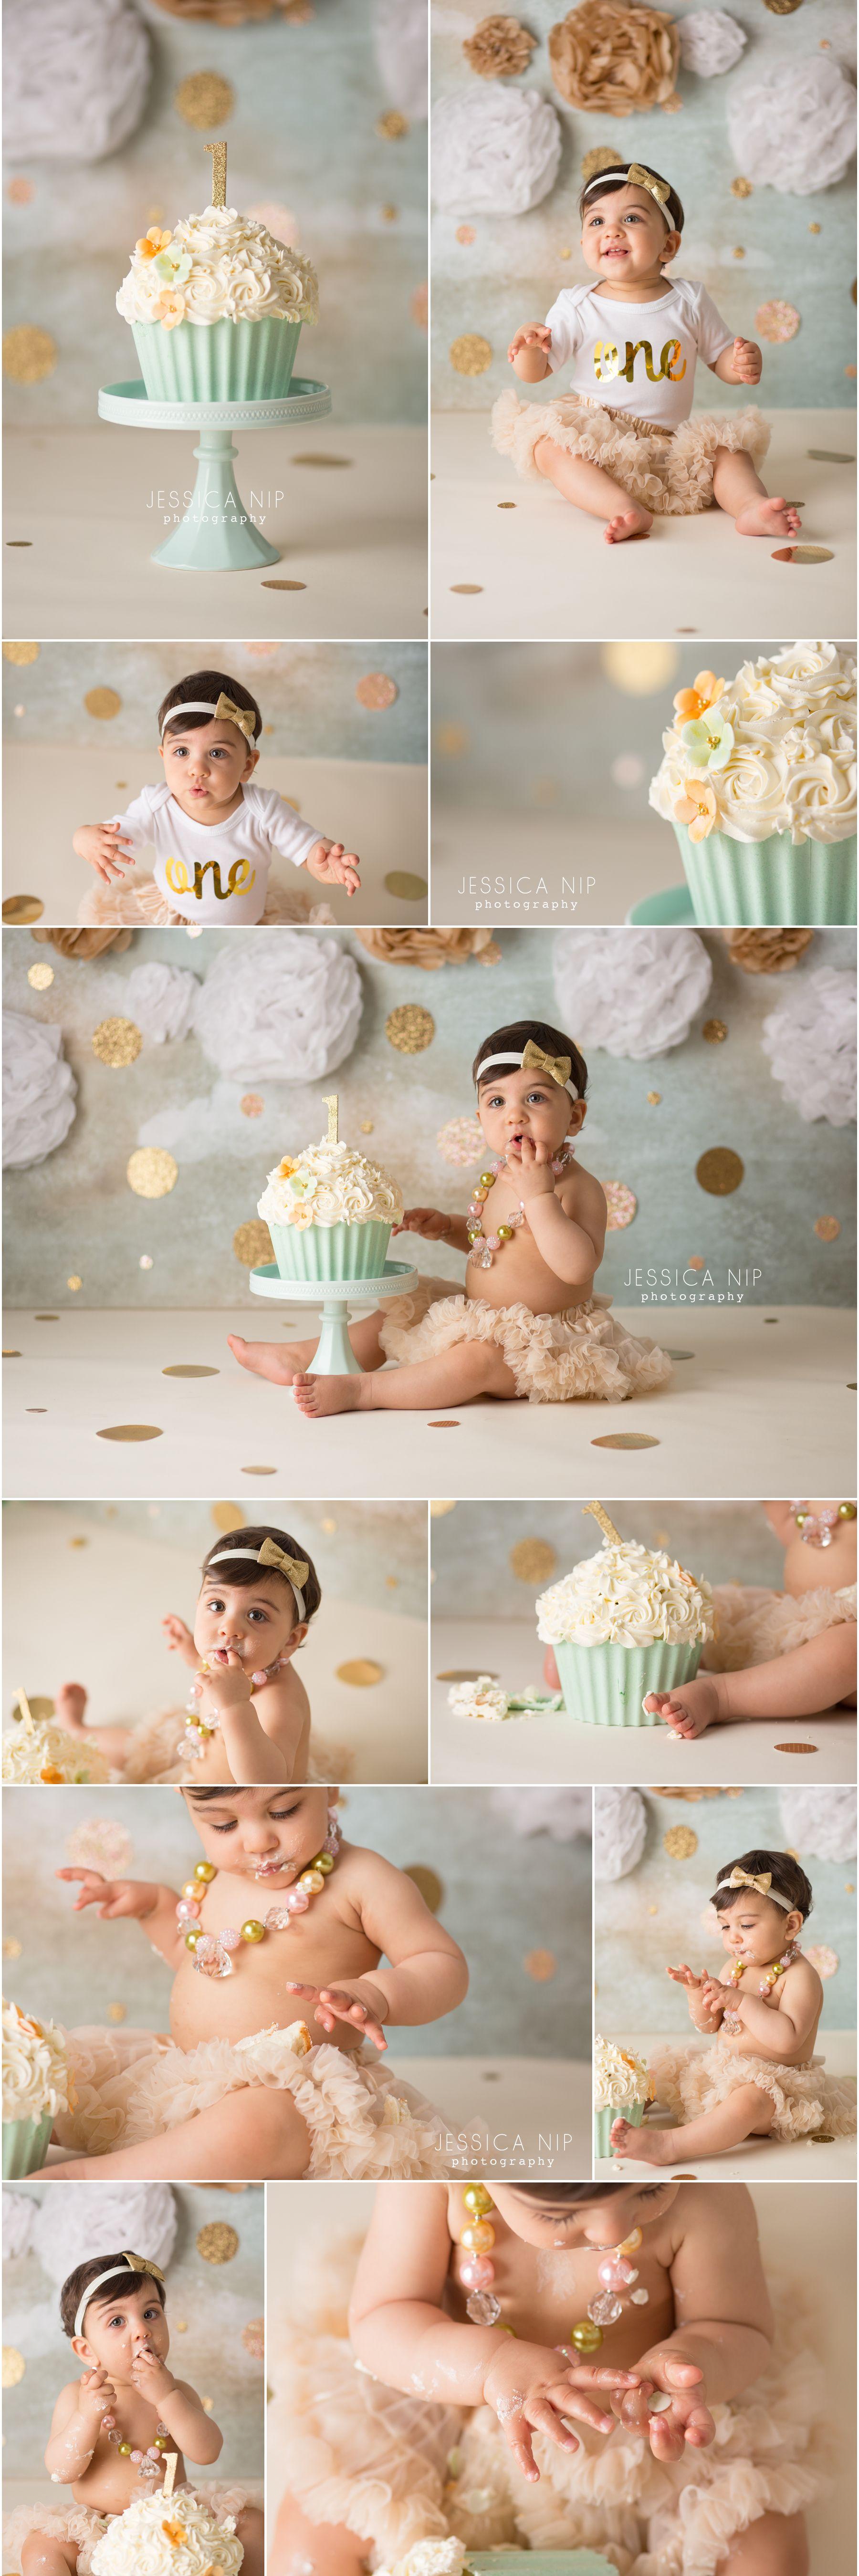 First birthday cake smash | Jessica Nip Photography | @2015 www.jessicanip.com | info@jessicanip.com | Toronto, Canada